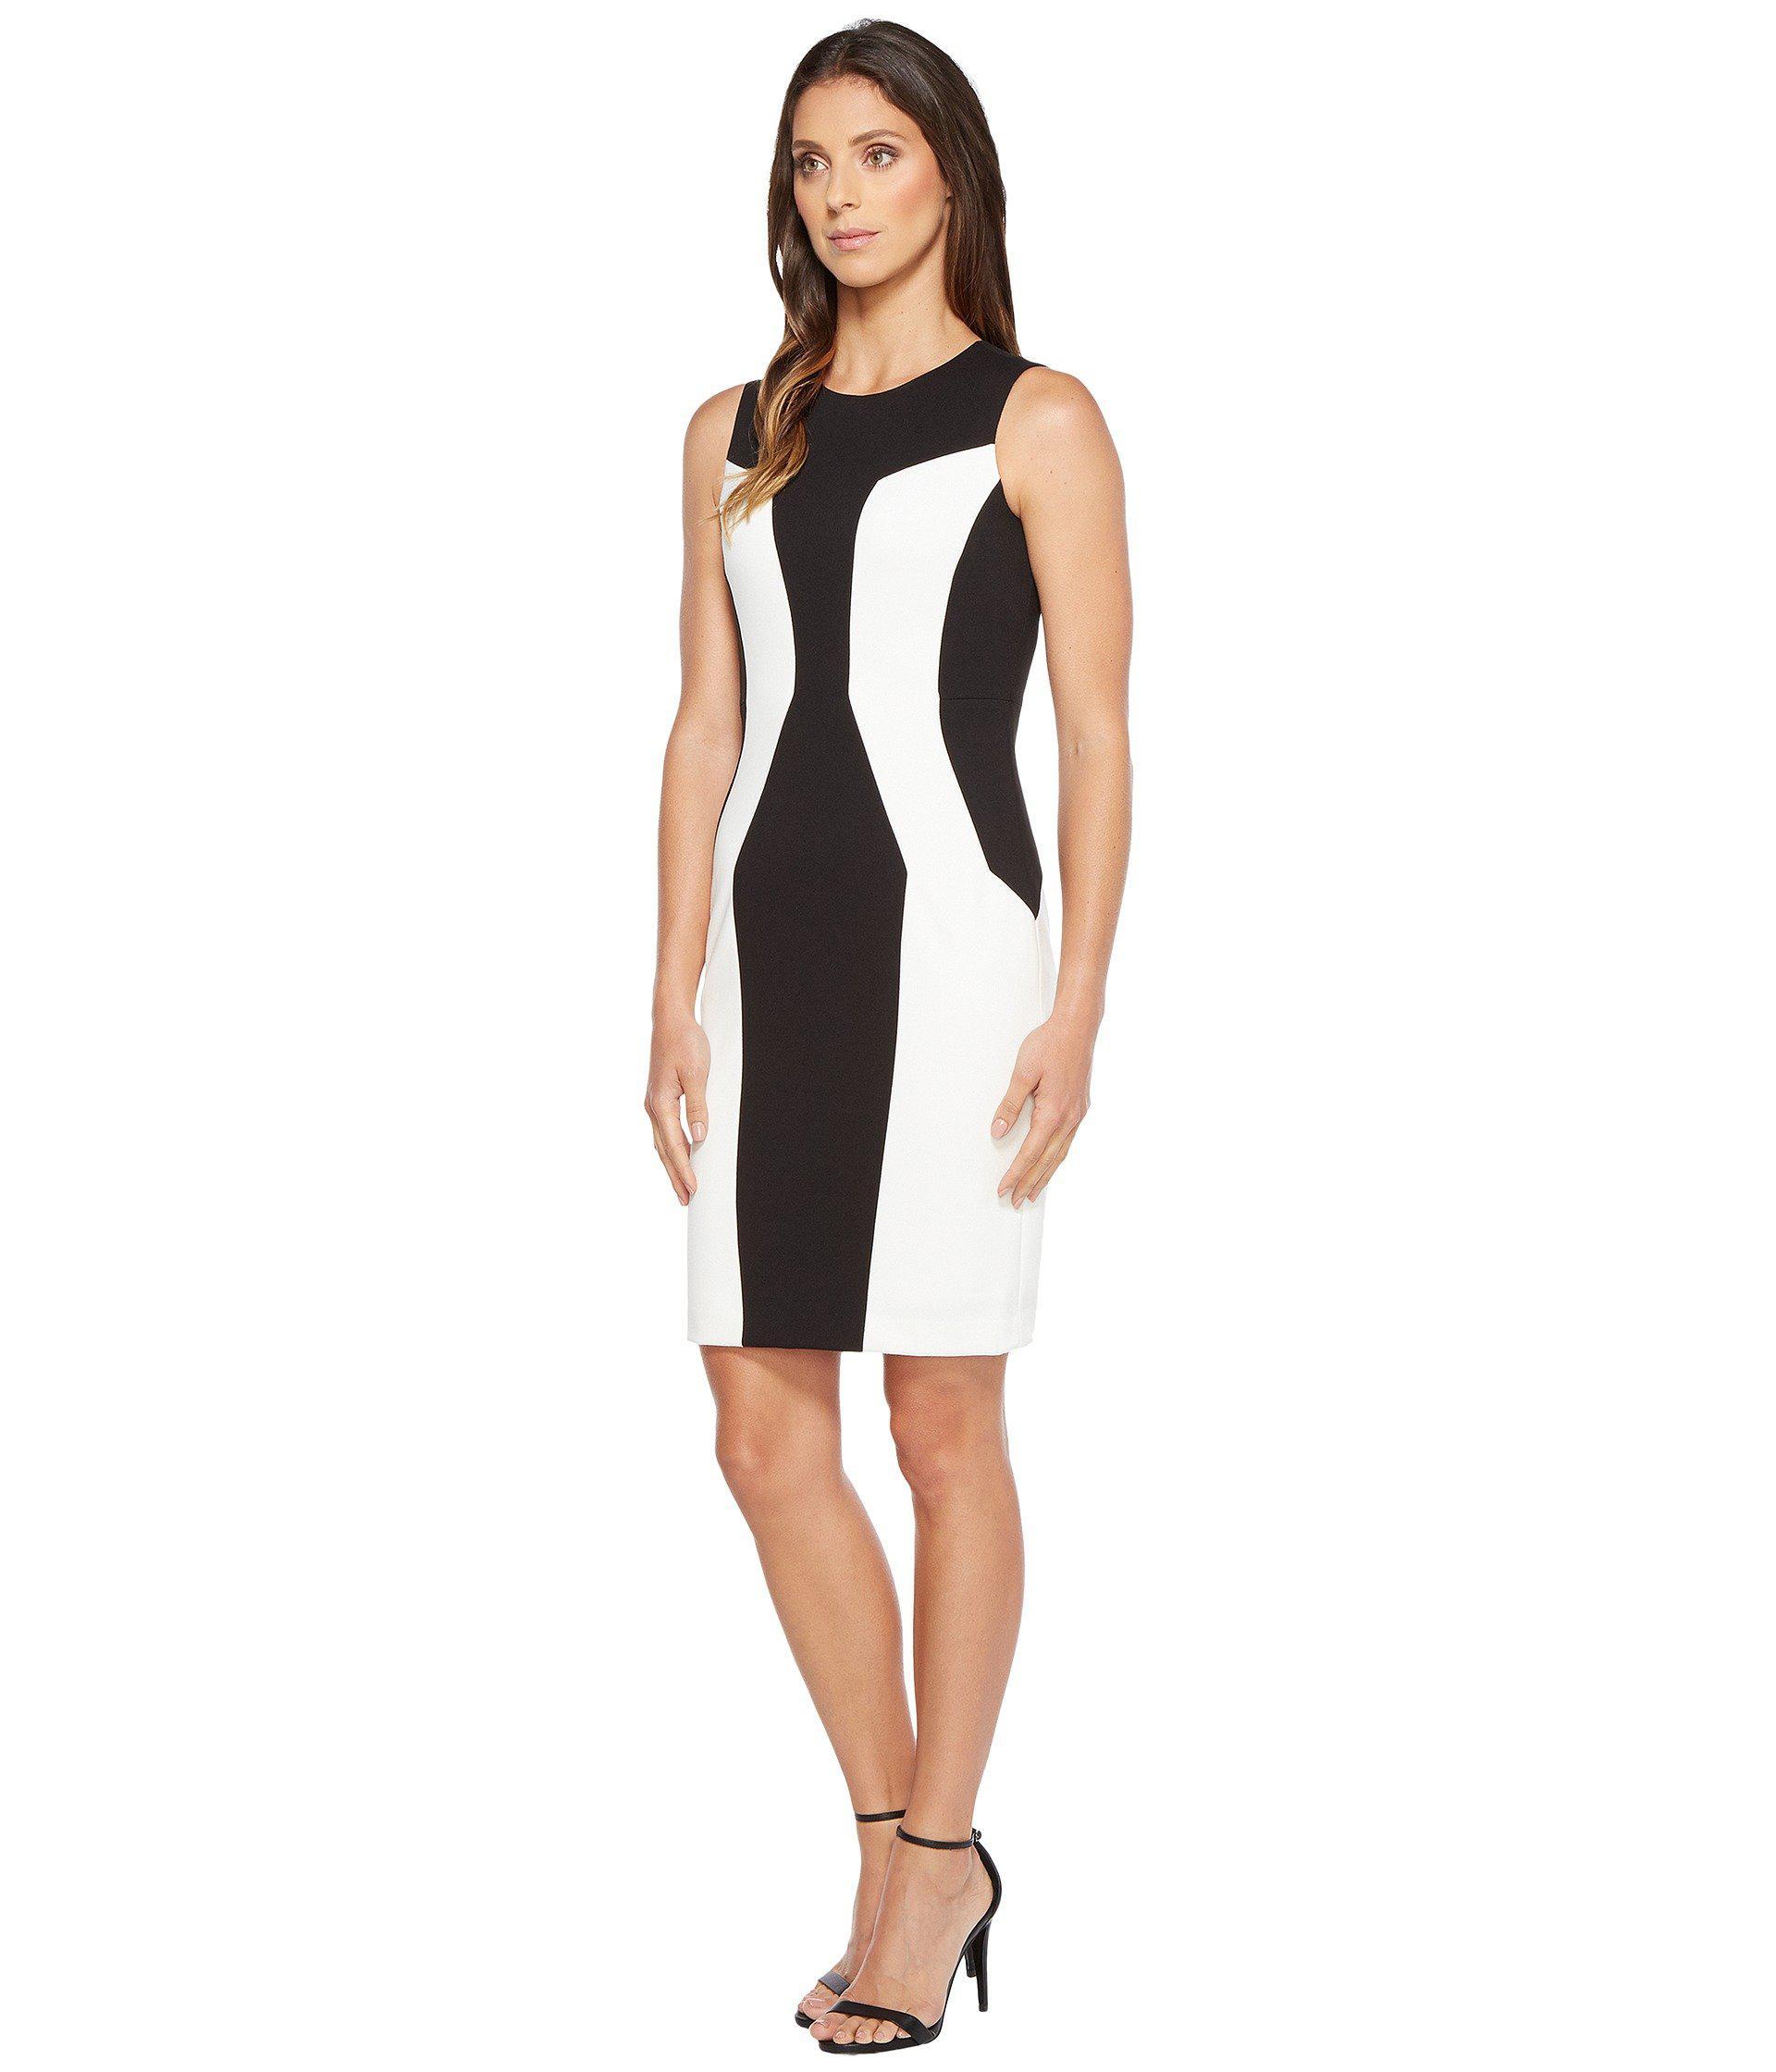 58b27572ae12c Lyst - Calvin Klein Color Block Ponte Sheath Dress in Black